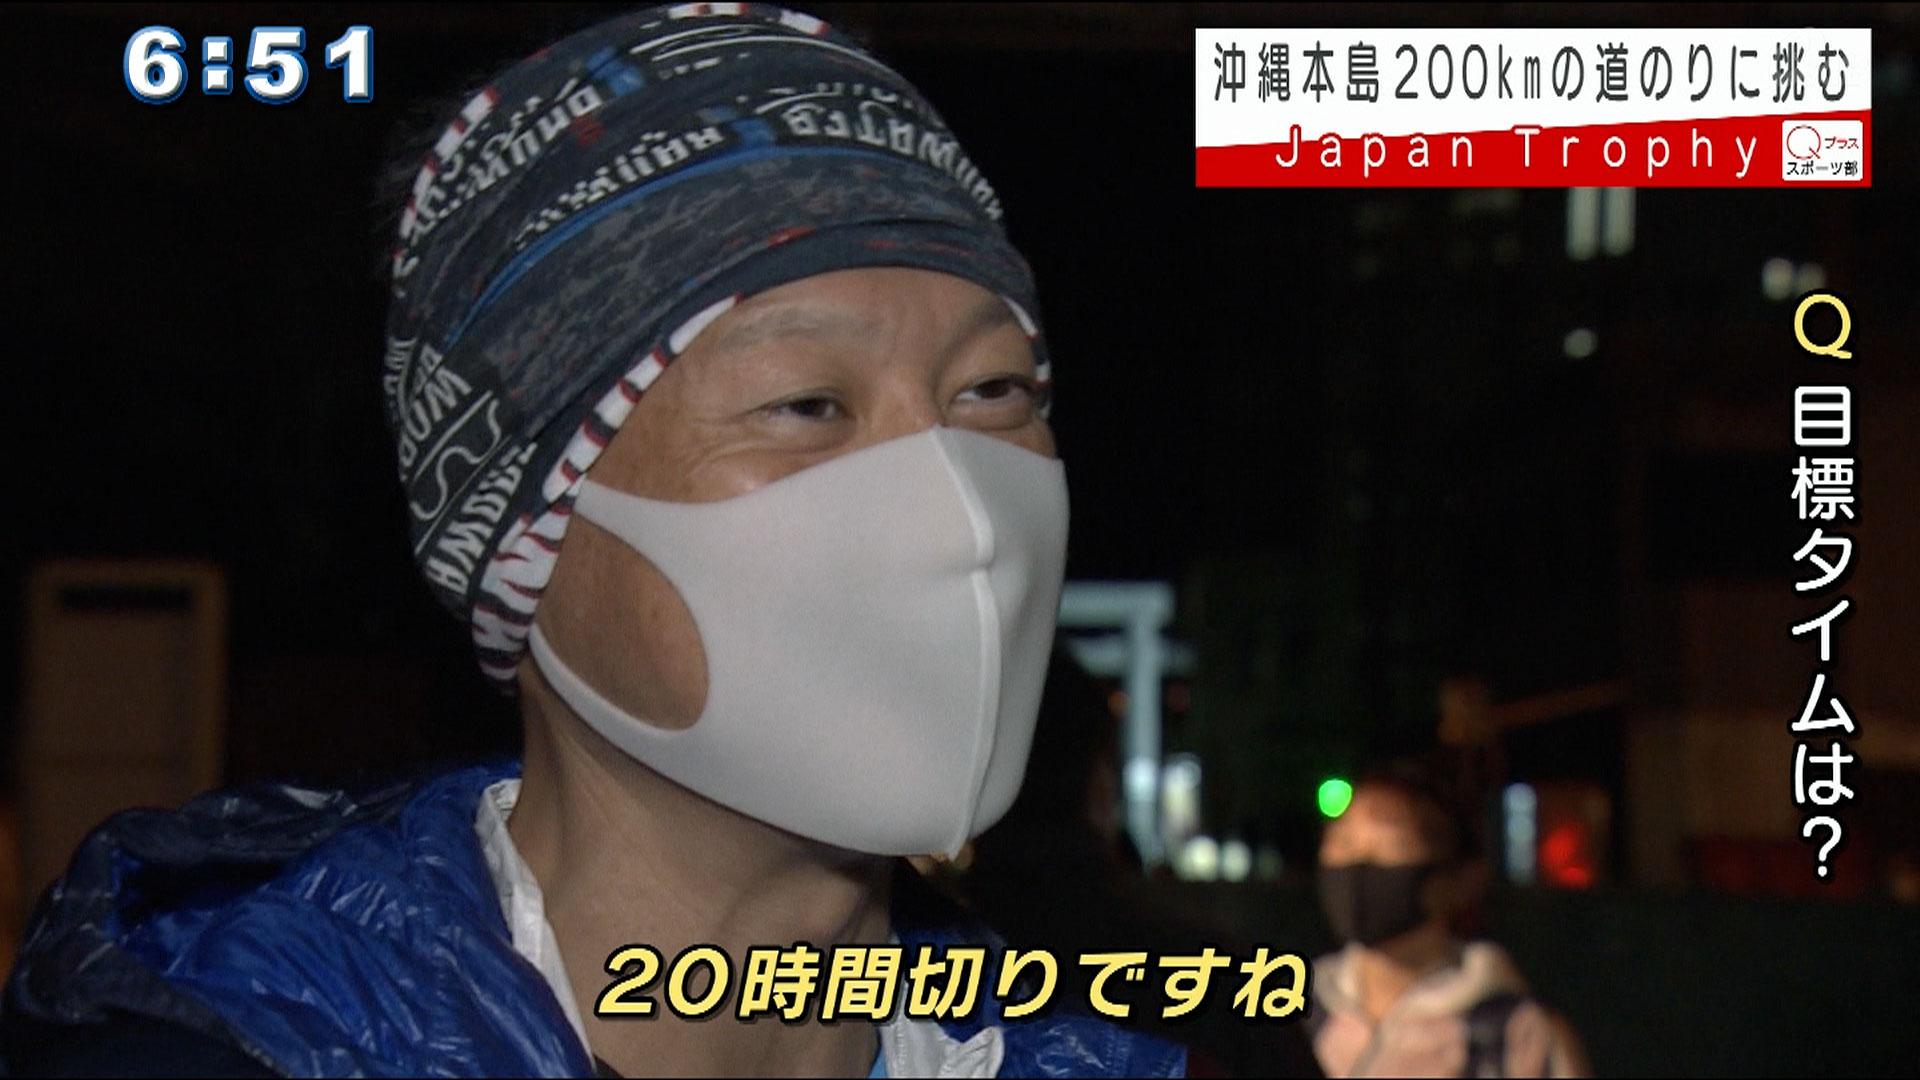 沖縄初開催! JAPAN TROPHY 200